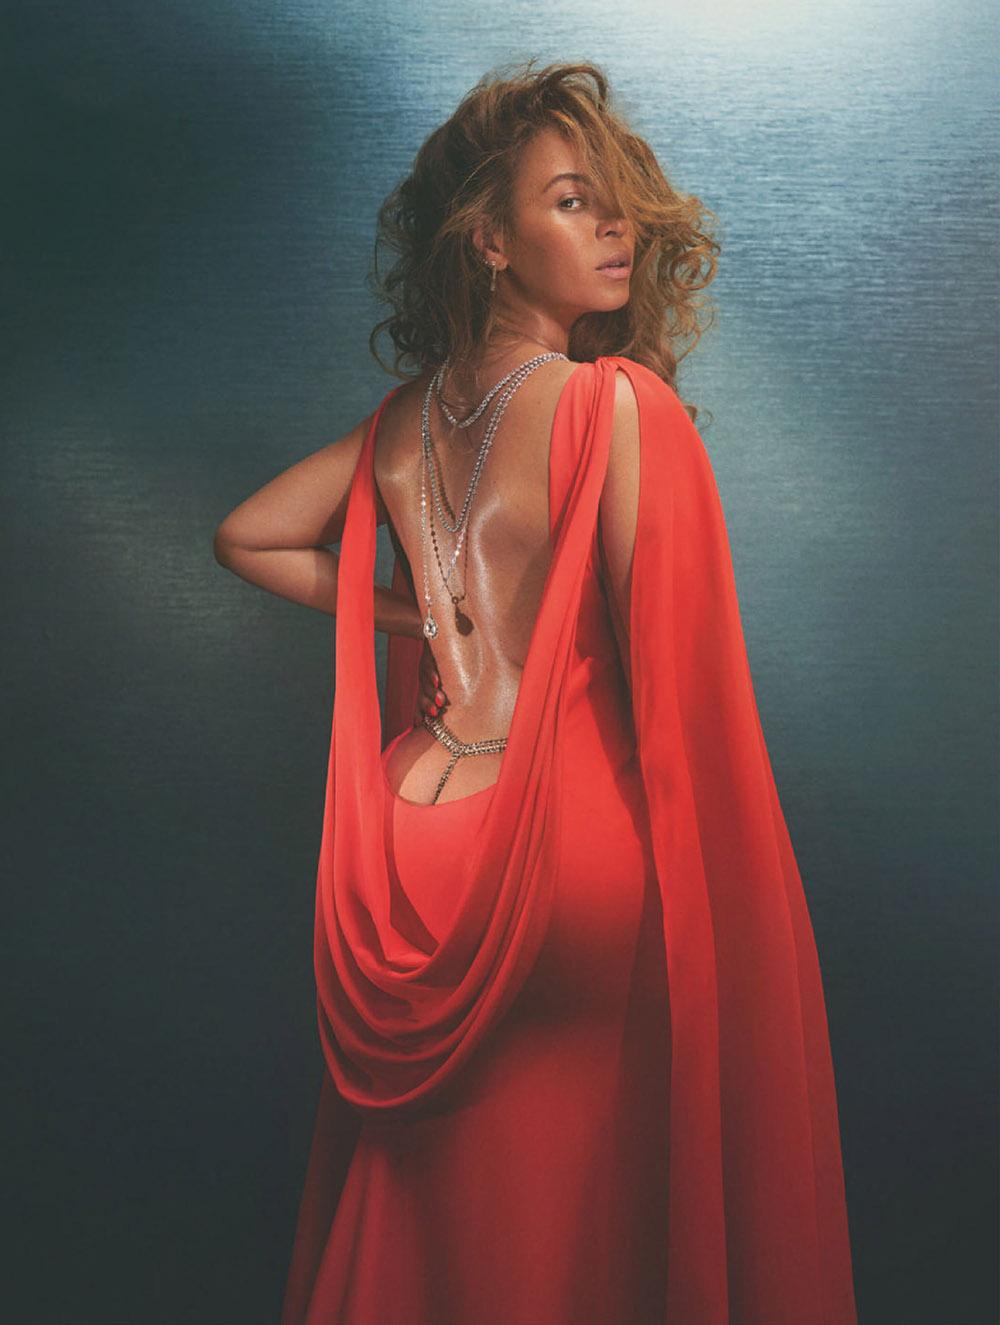 Beyoncé covers British Vogue December 2020 by Kennedi Carter